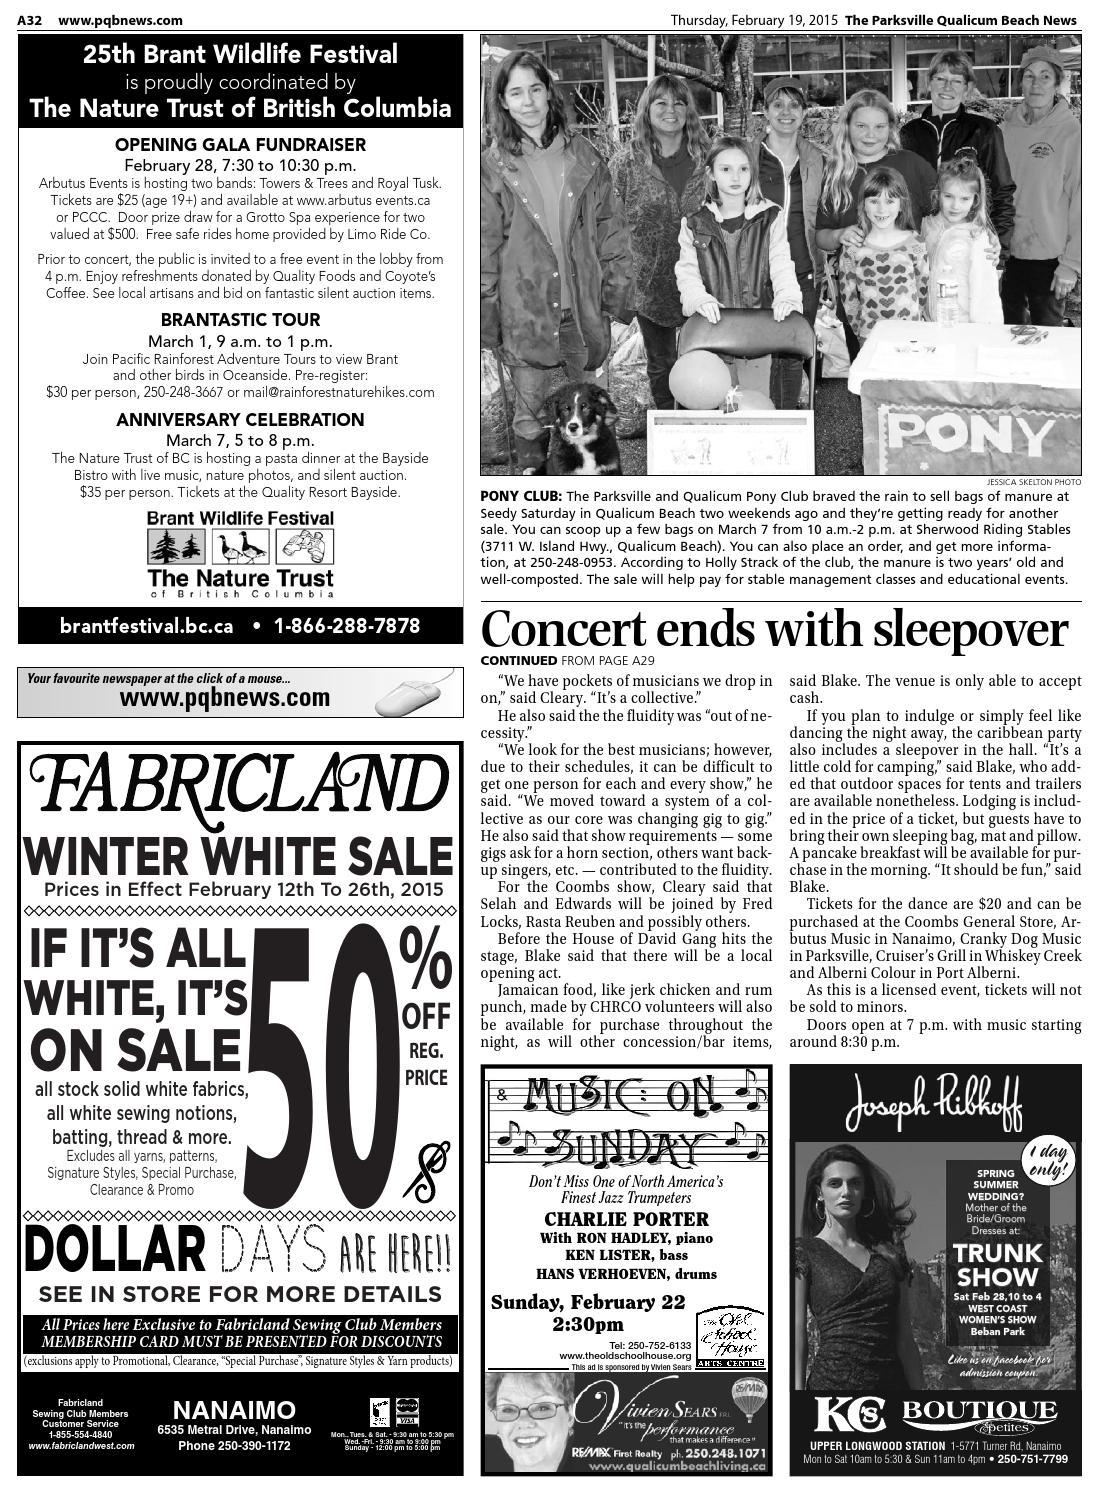 Parksville Qualicum Beach News, February 19, 2015 by Black